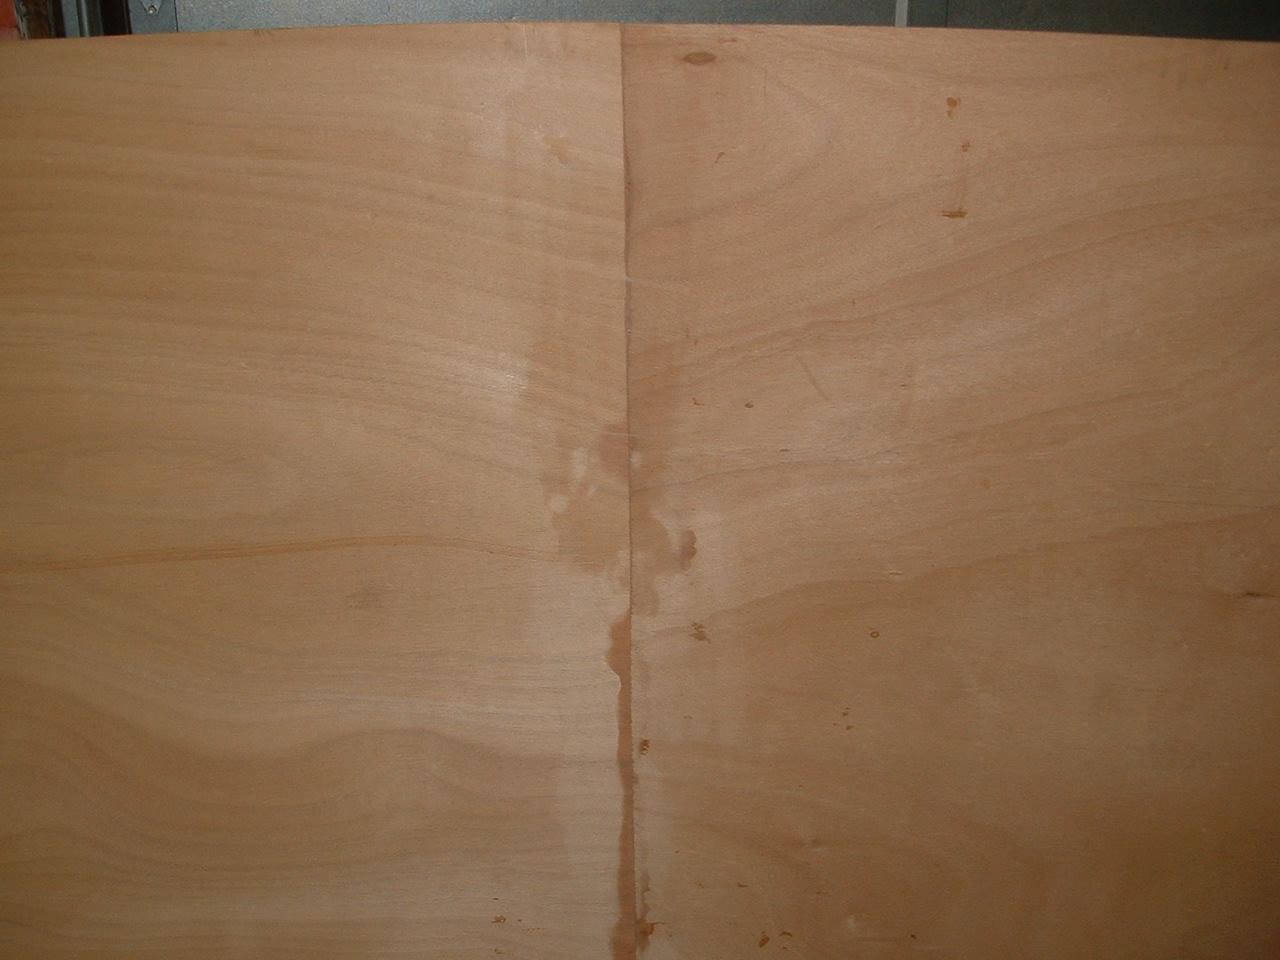 2 X 8 Plywood Sheets Walesfootprint Org